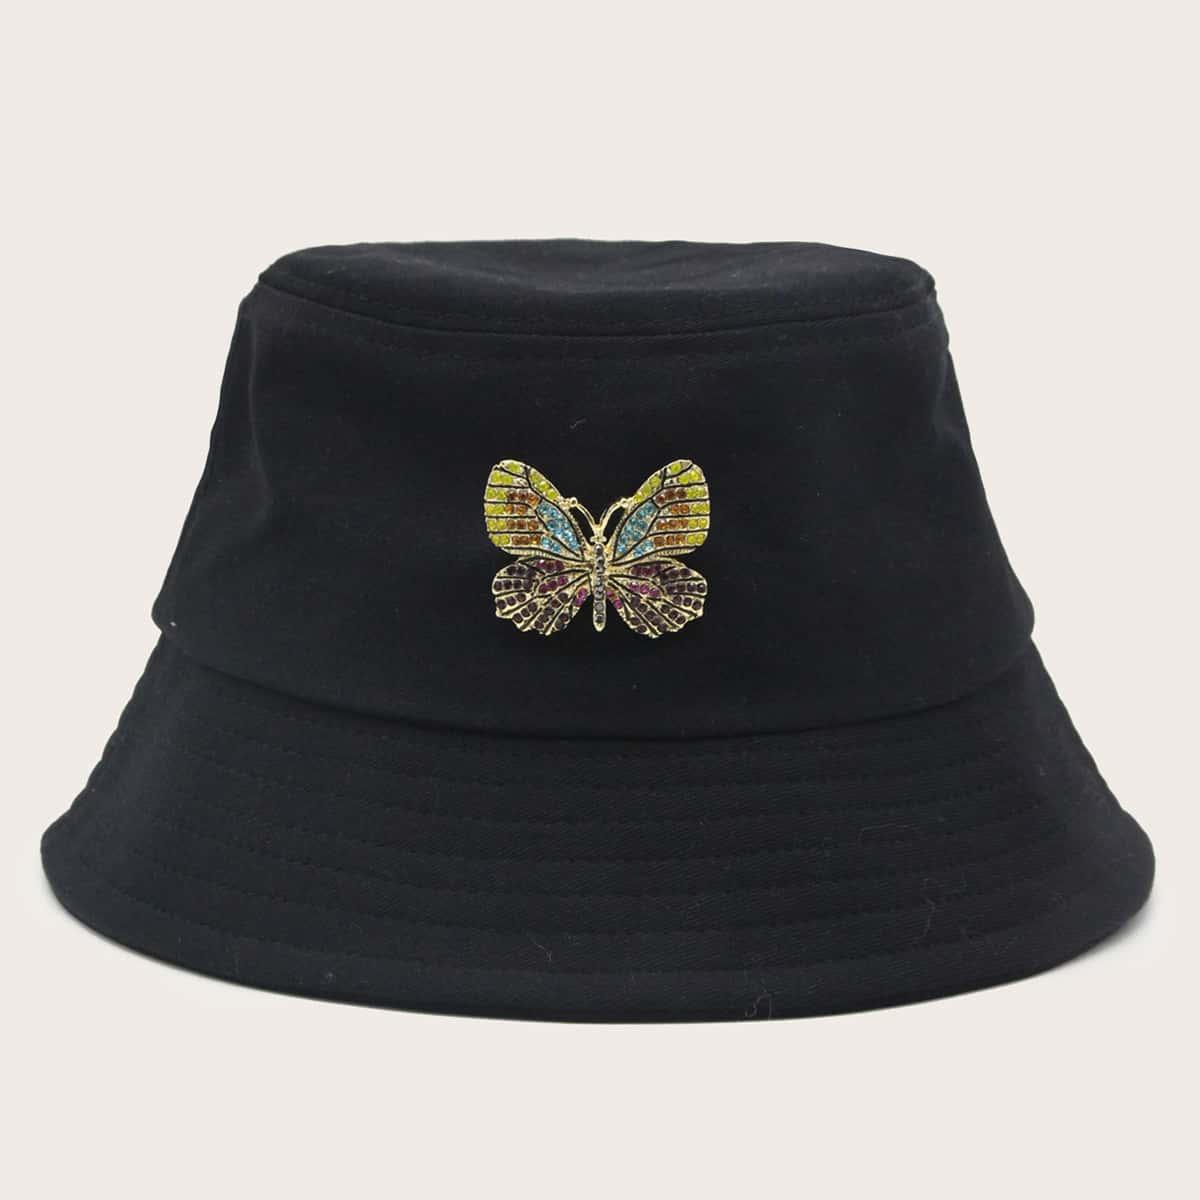 Шляпа с узором бабочки фото